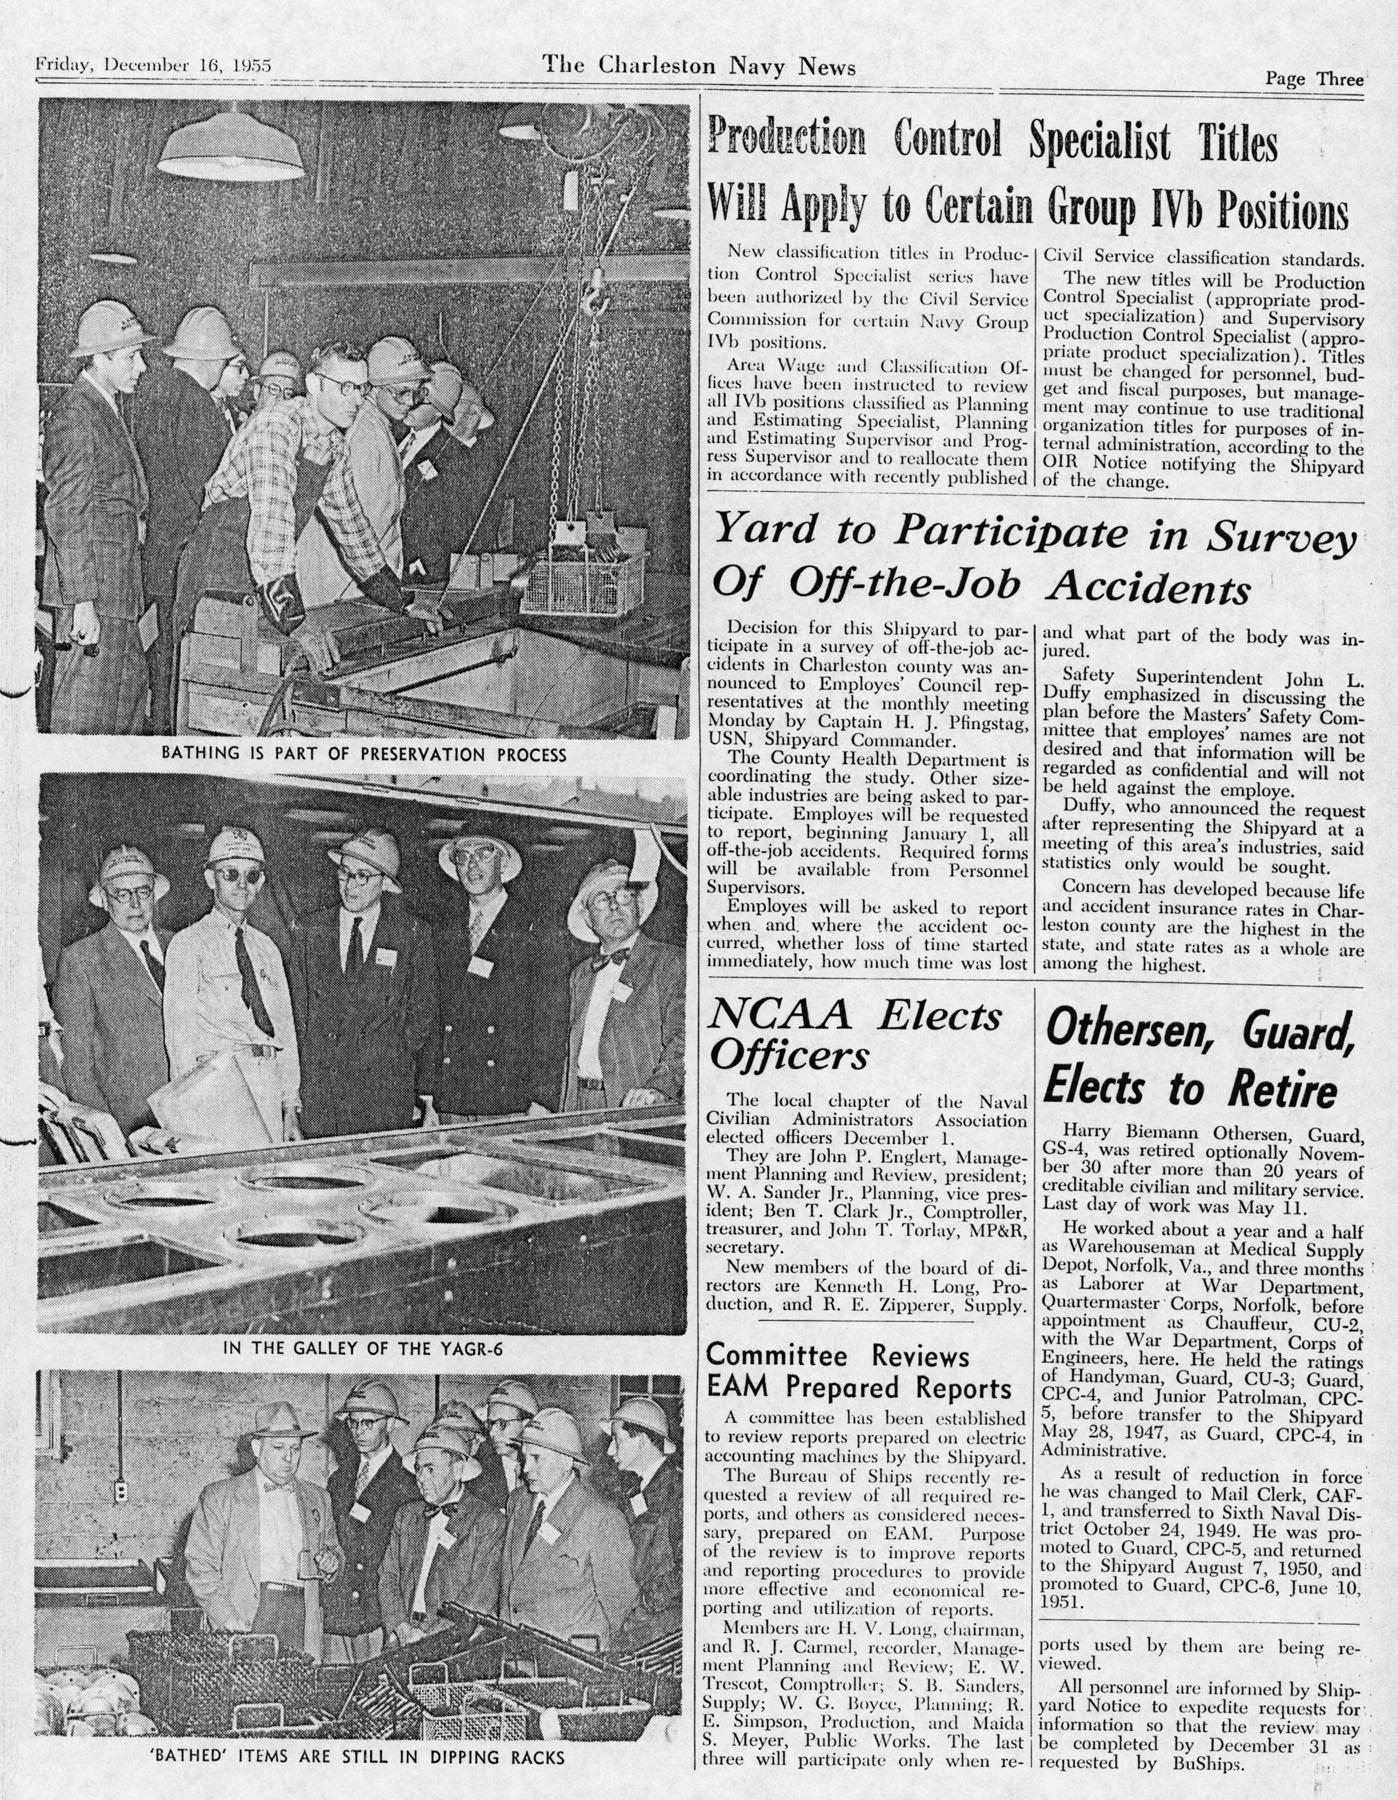 The Charleston Navy News, Volume 14, Edition 11, page iii